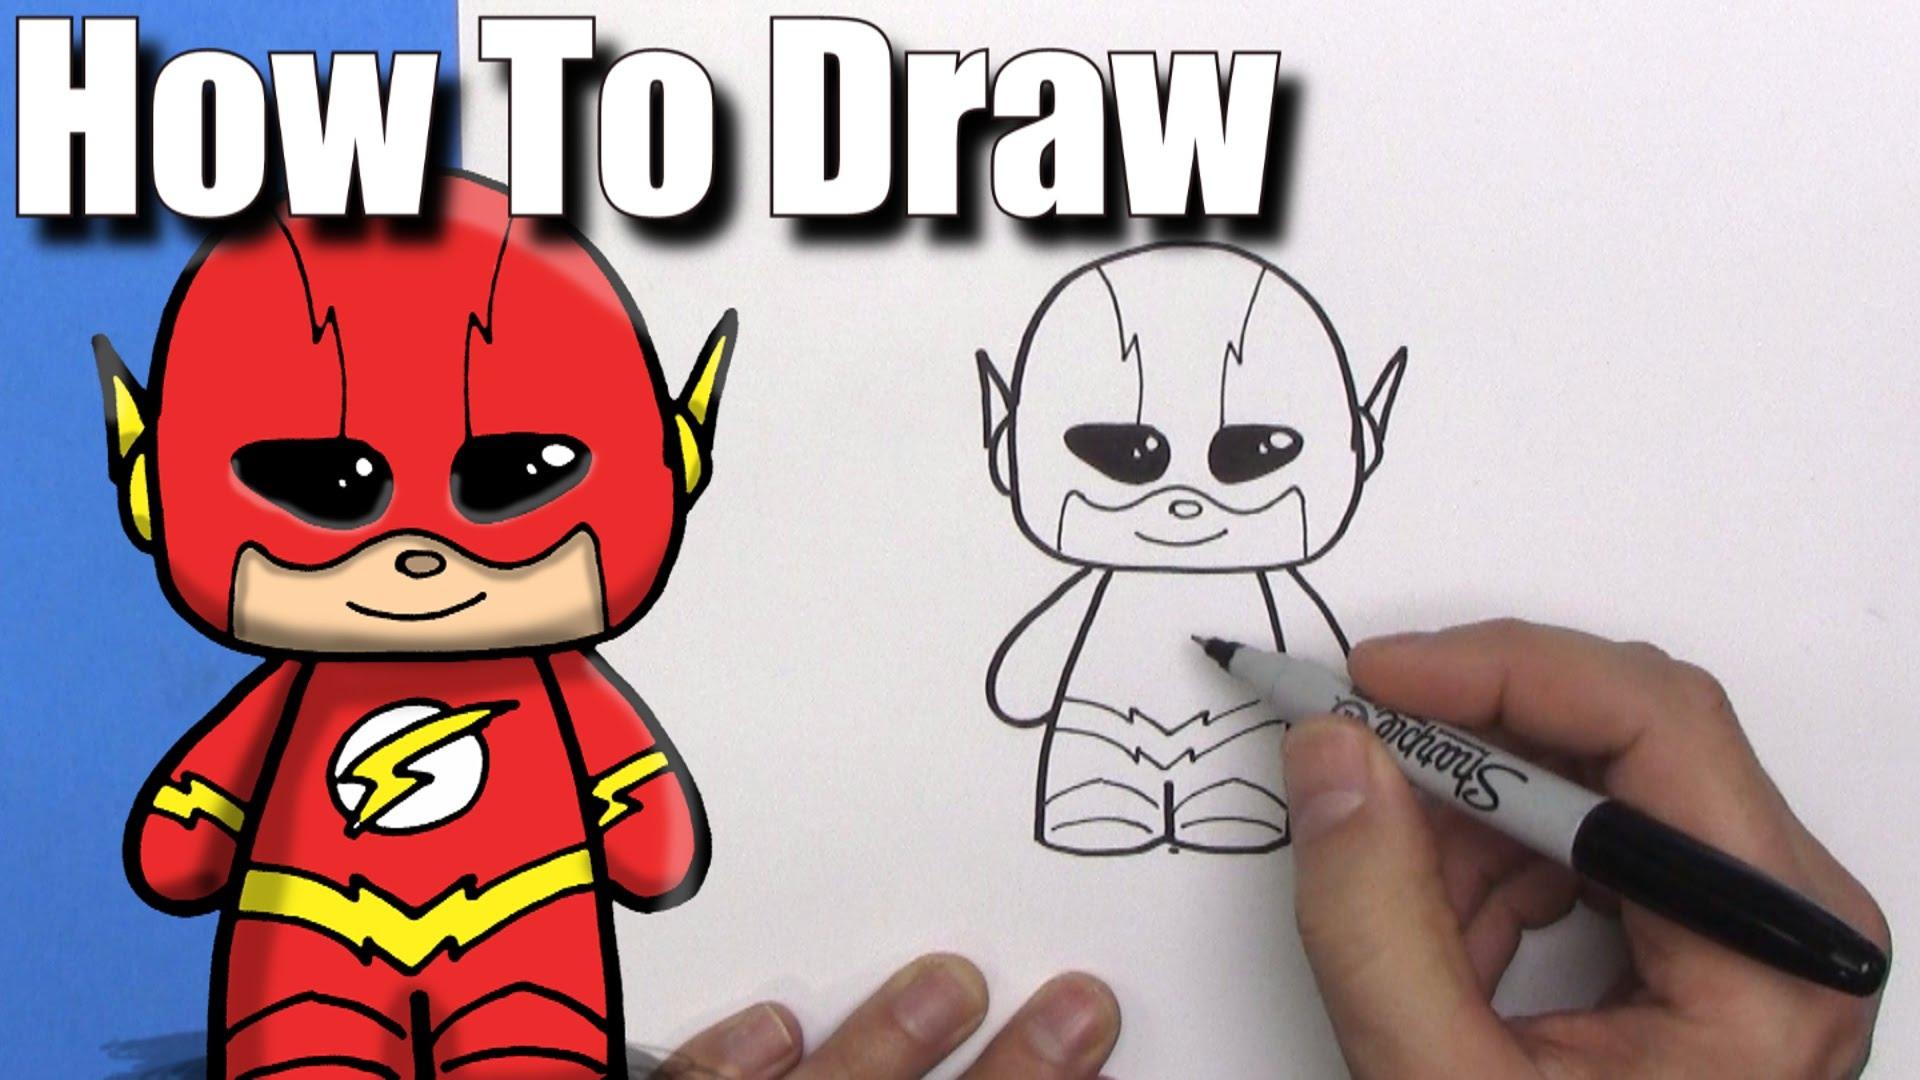 1920x1080 How To Draw A Cute Cartoon The Flash